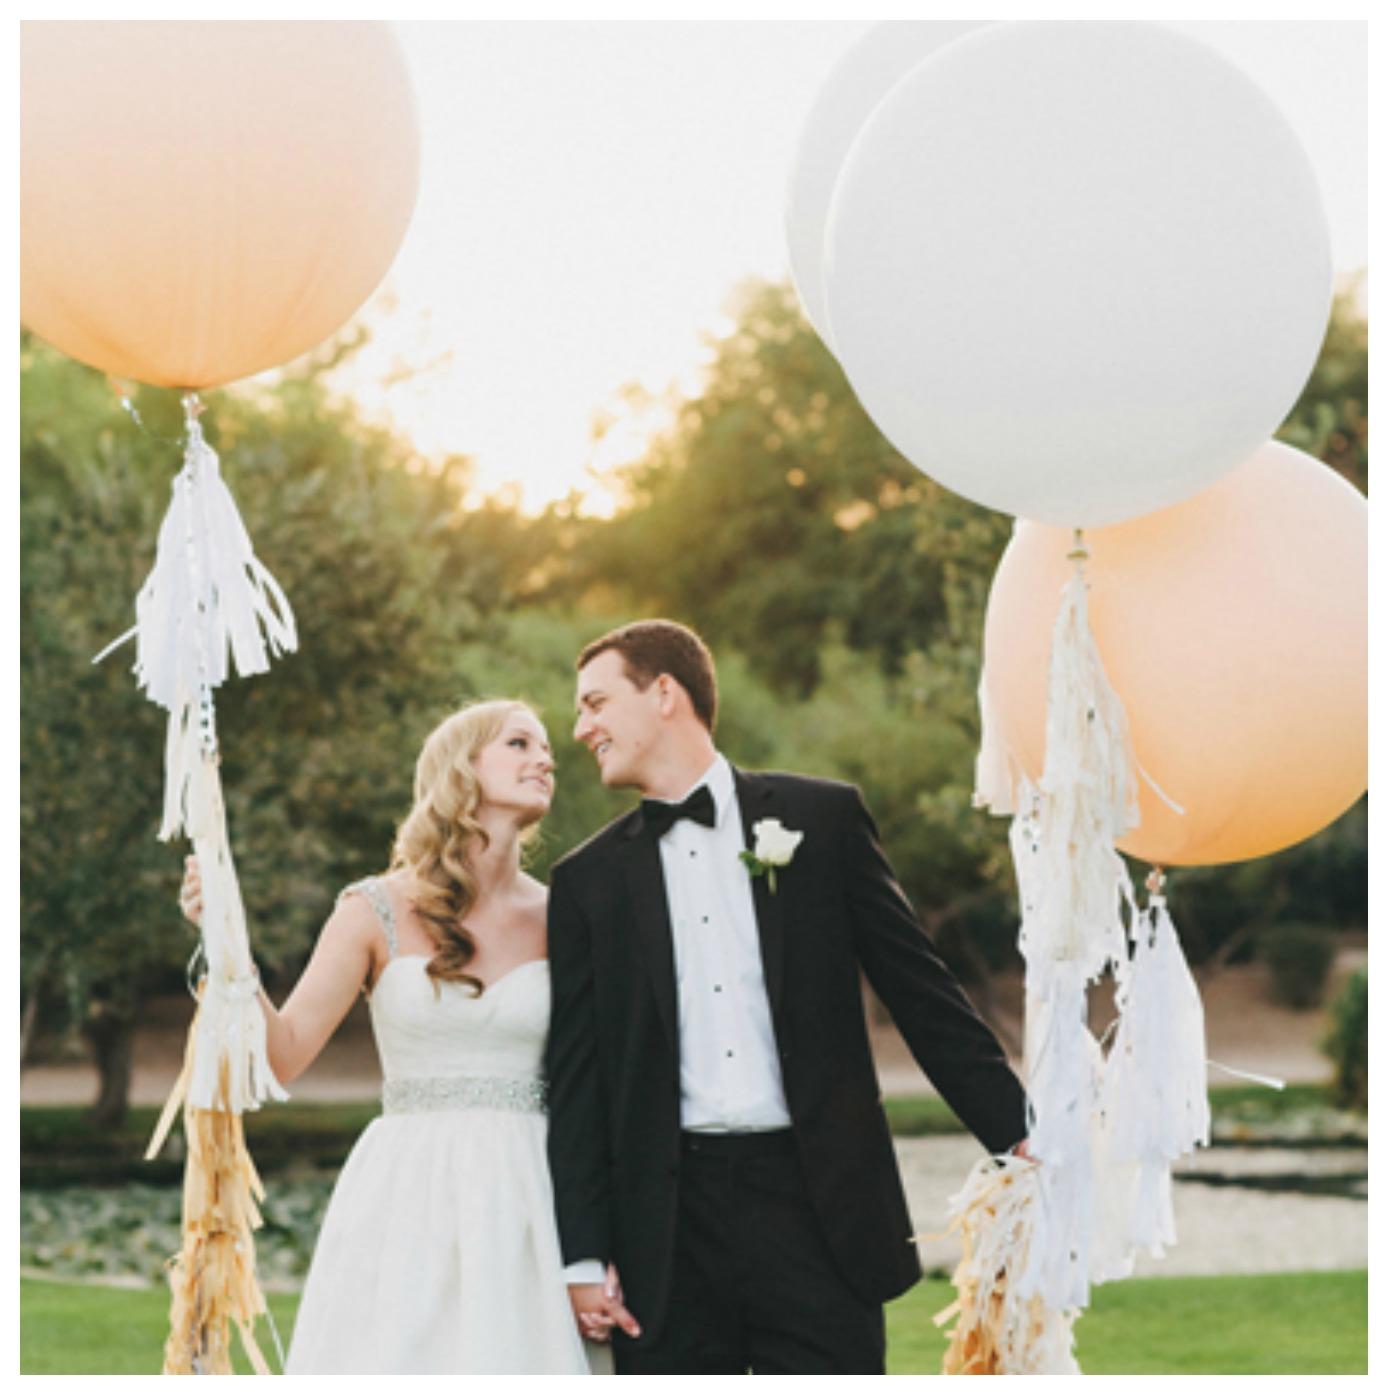 Ten Wedding Balloon Ideas We Love